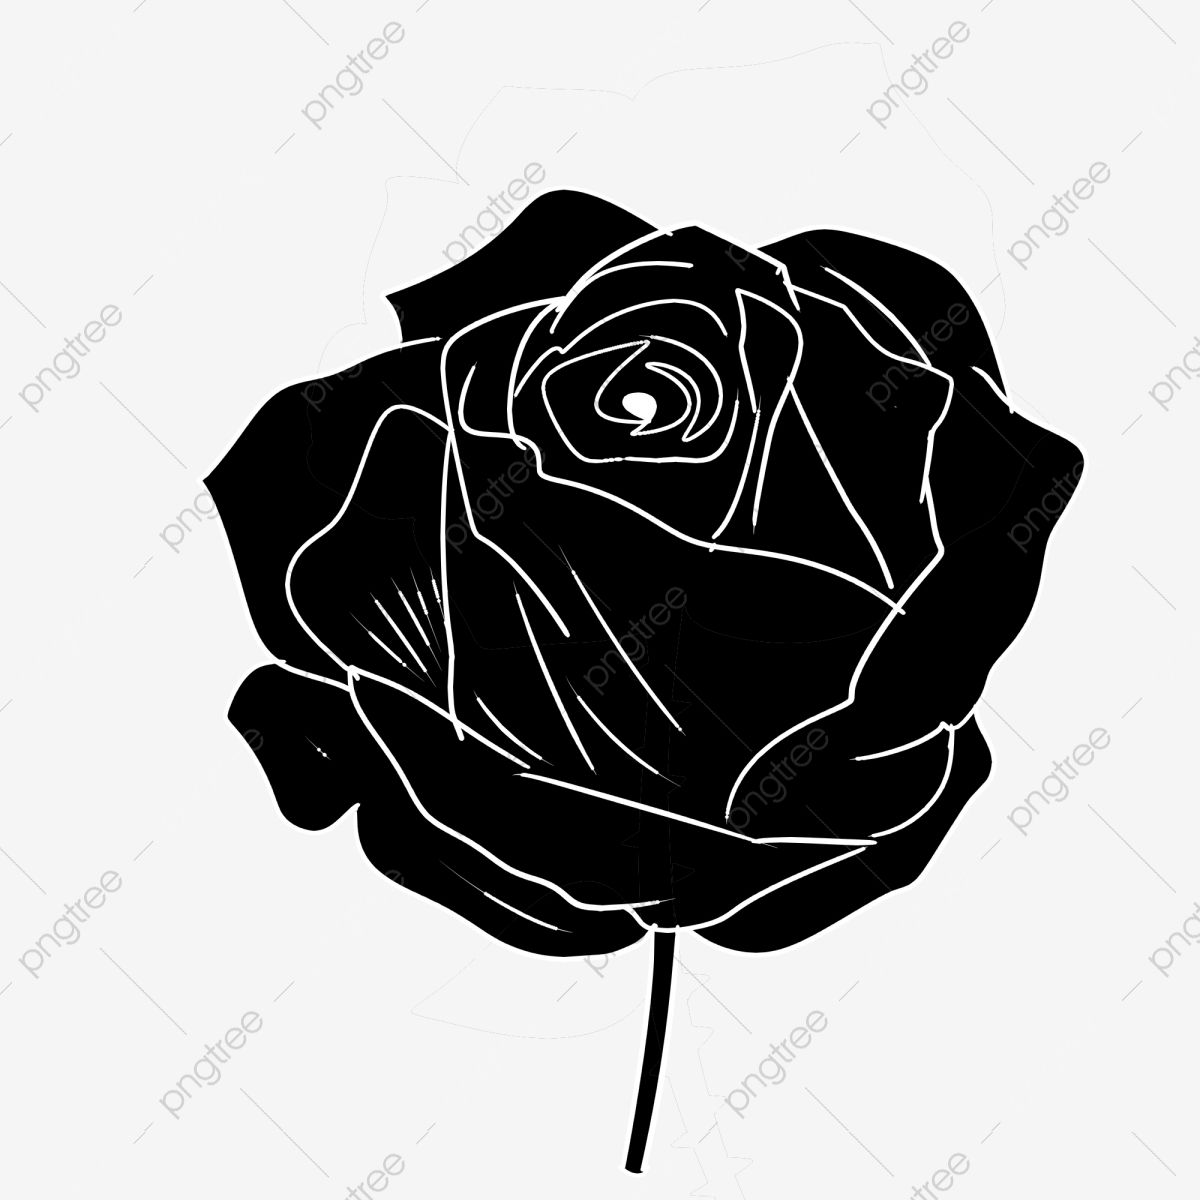 Flor Planta Rosa Negra Flor Negra Flor Png Y Psd Para Descargar Gratis Pngtree Rosa Negra Flor Ilustraciones Florales Dibujos